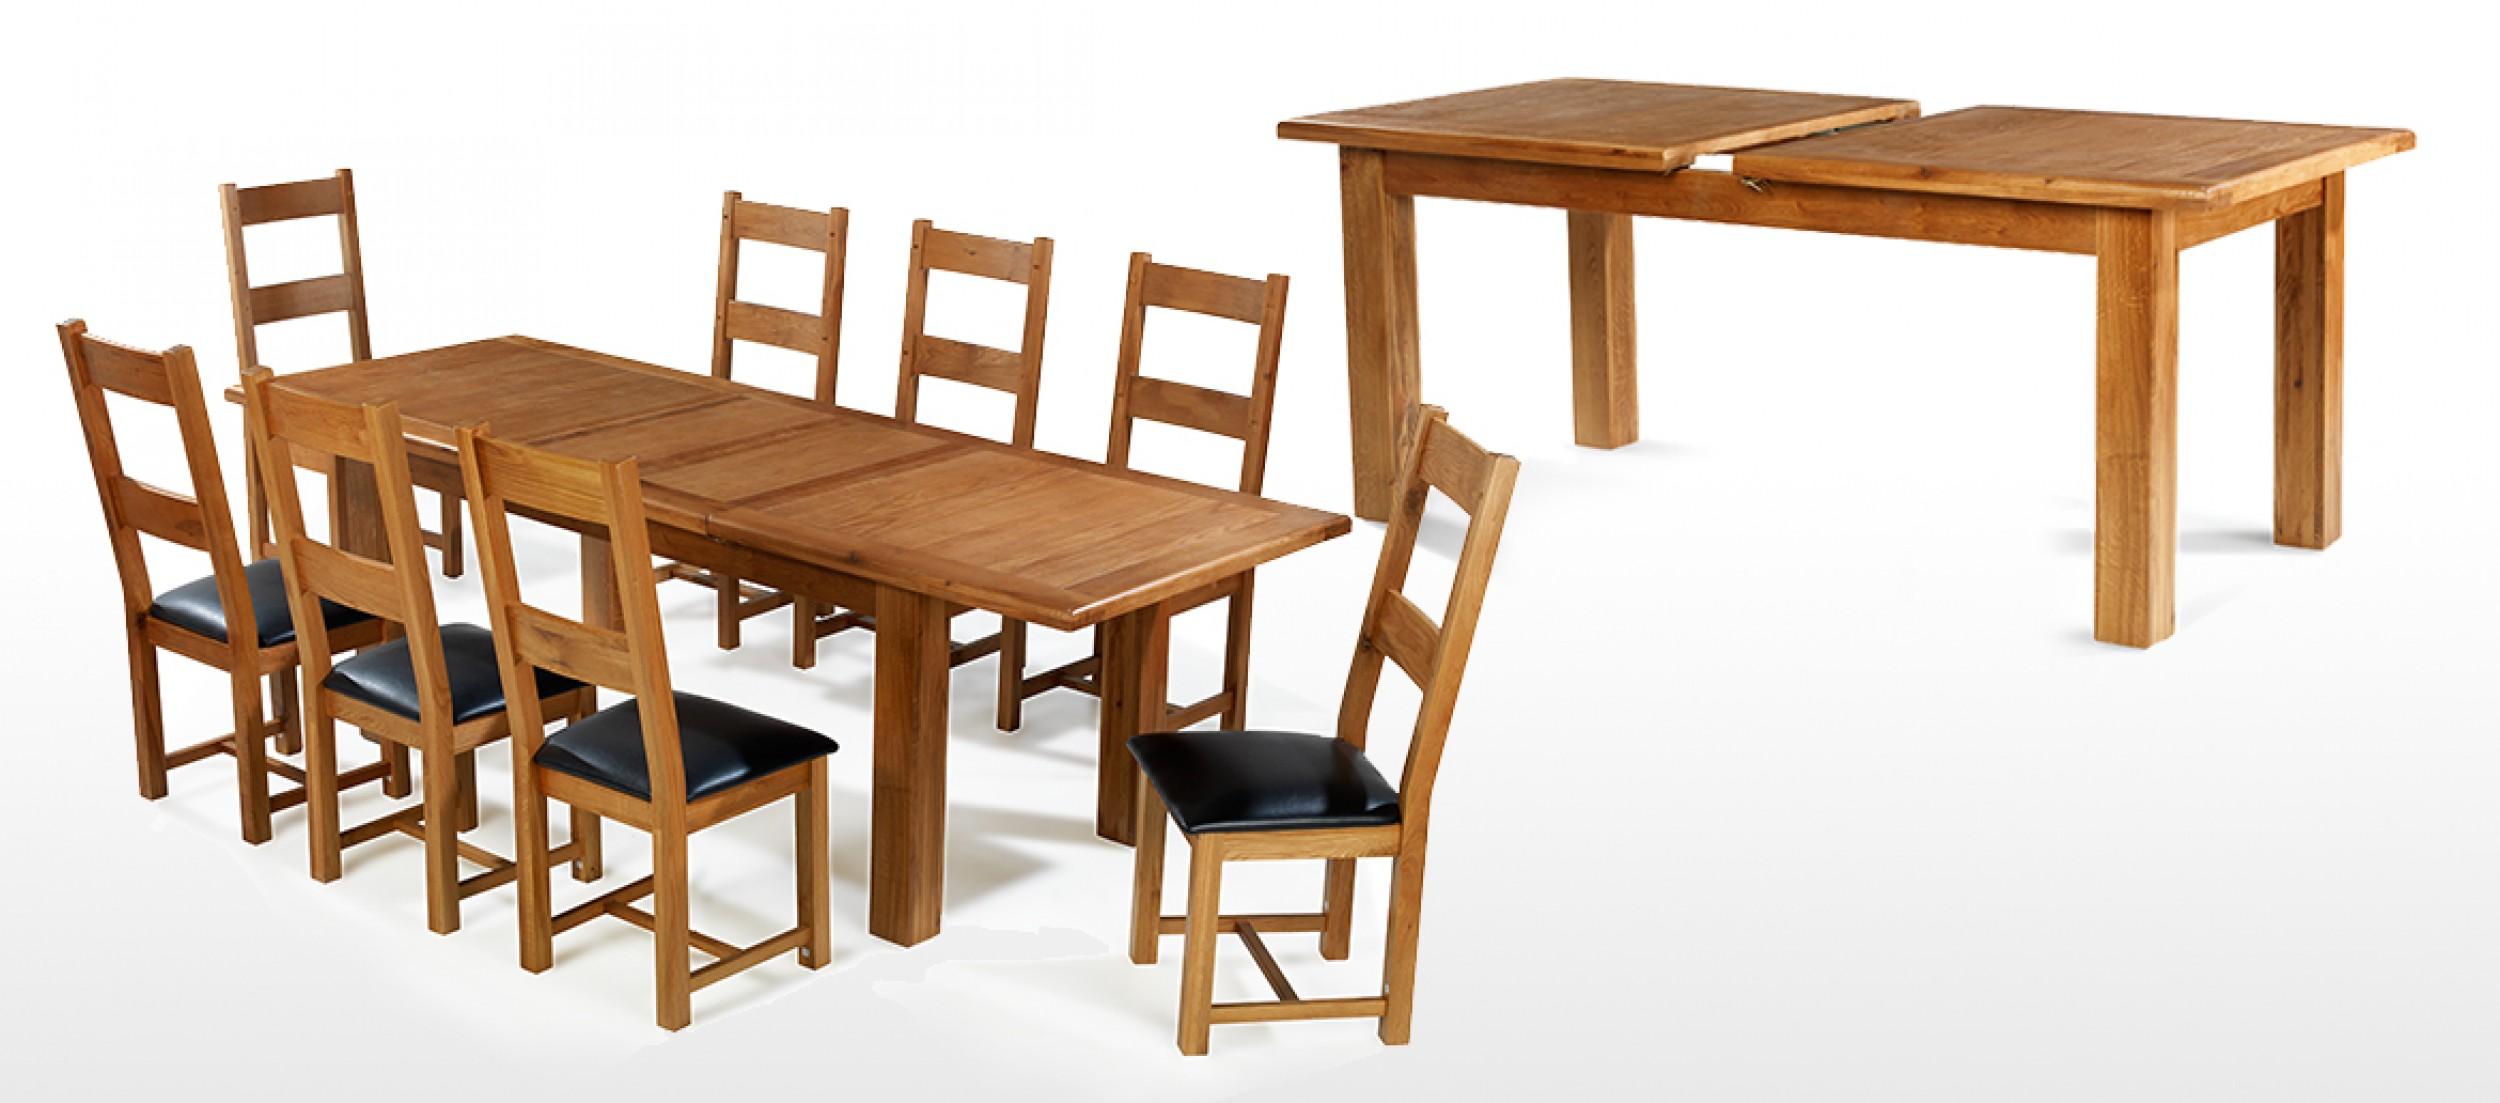 Barham oak 180 250 cm extending dining table and 8 chairs for Extending dining table and chairs